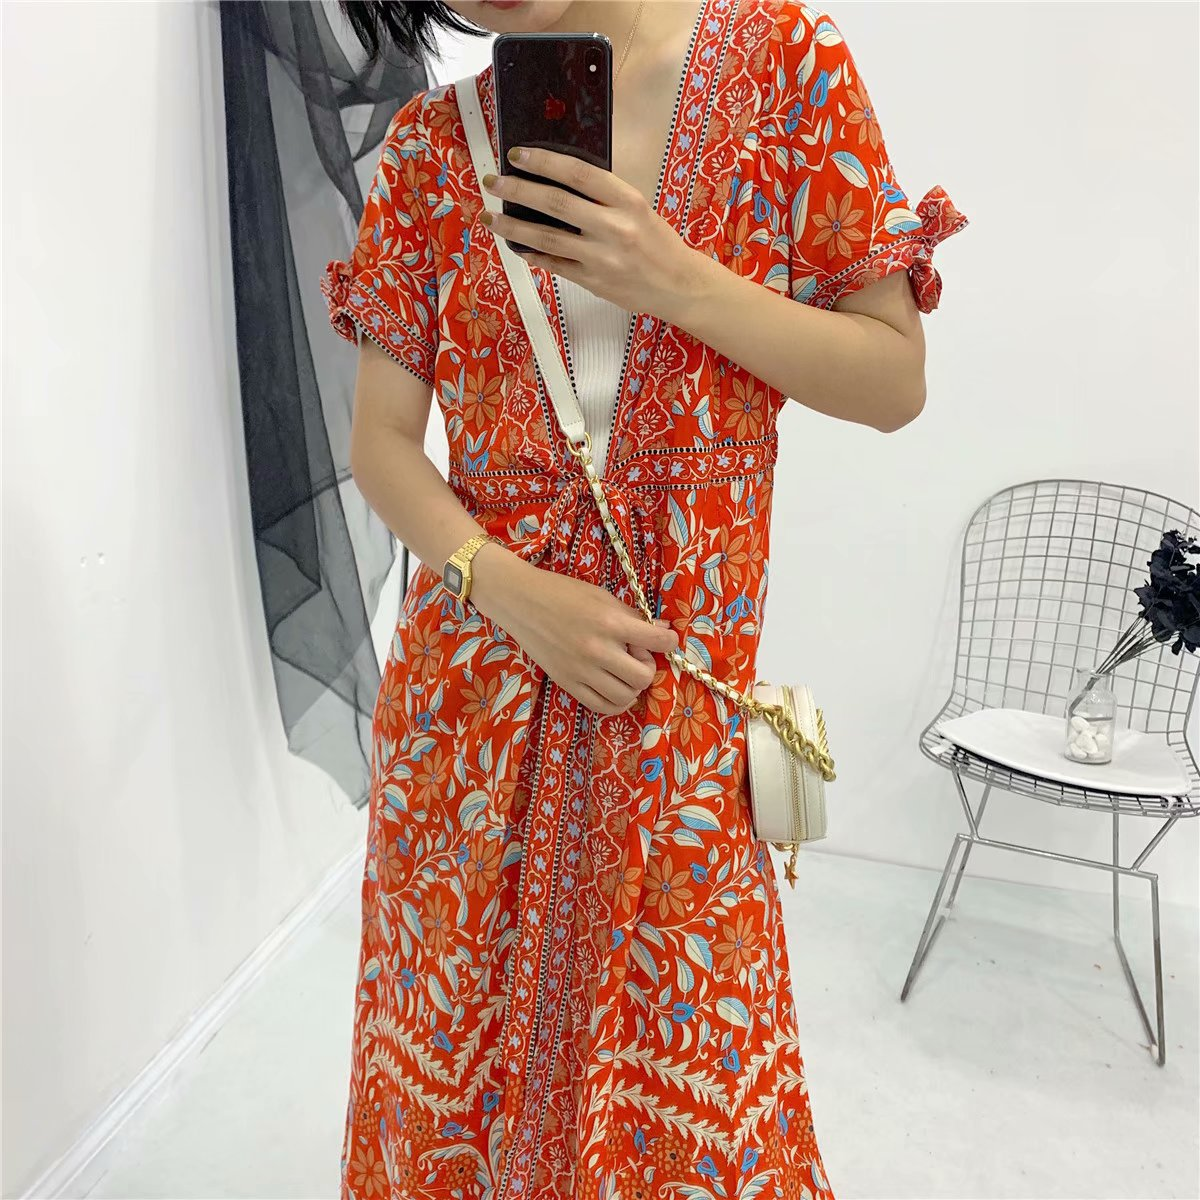 Western Style 2019 Summer New Style Orange Gardenia V-neck Dress Women Dress D1306